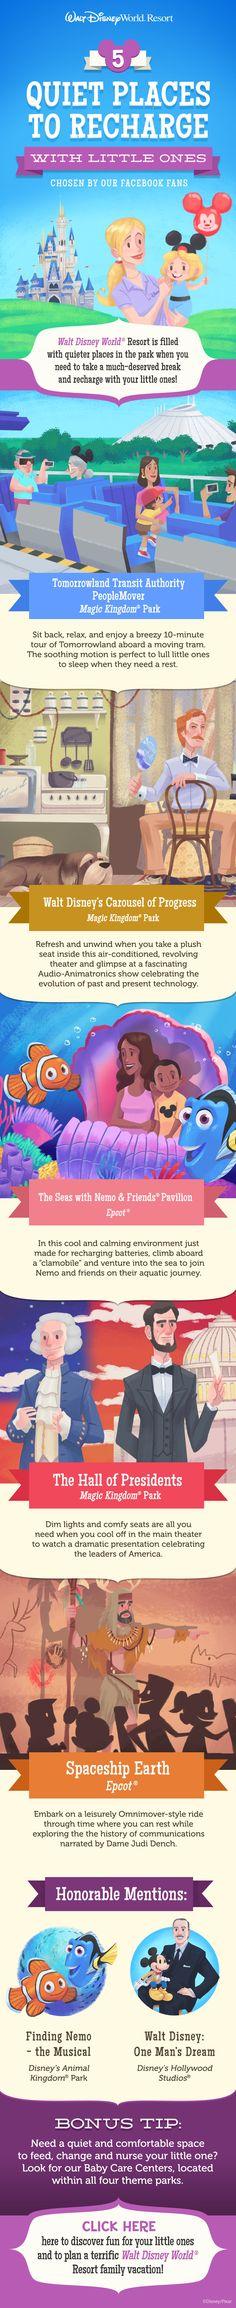 Top 5 Quiet Places to Recharge with Little Ones at Walt Disney World! #prek #DisneyKids